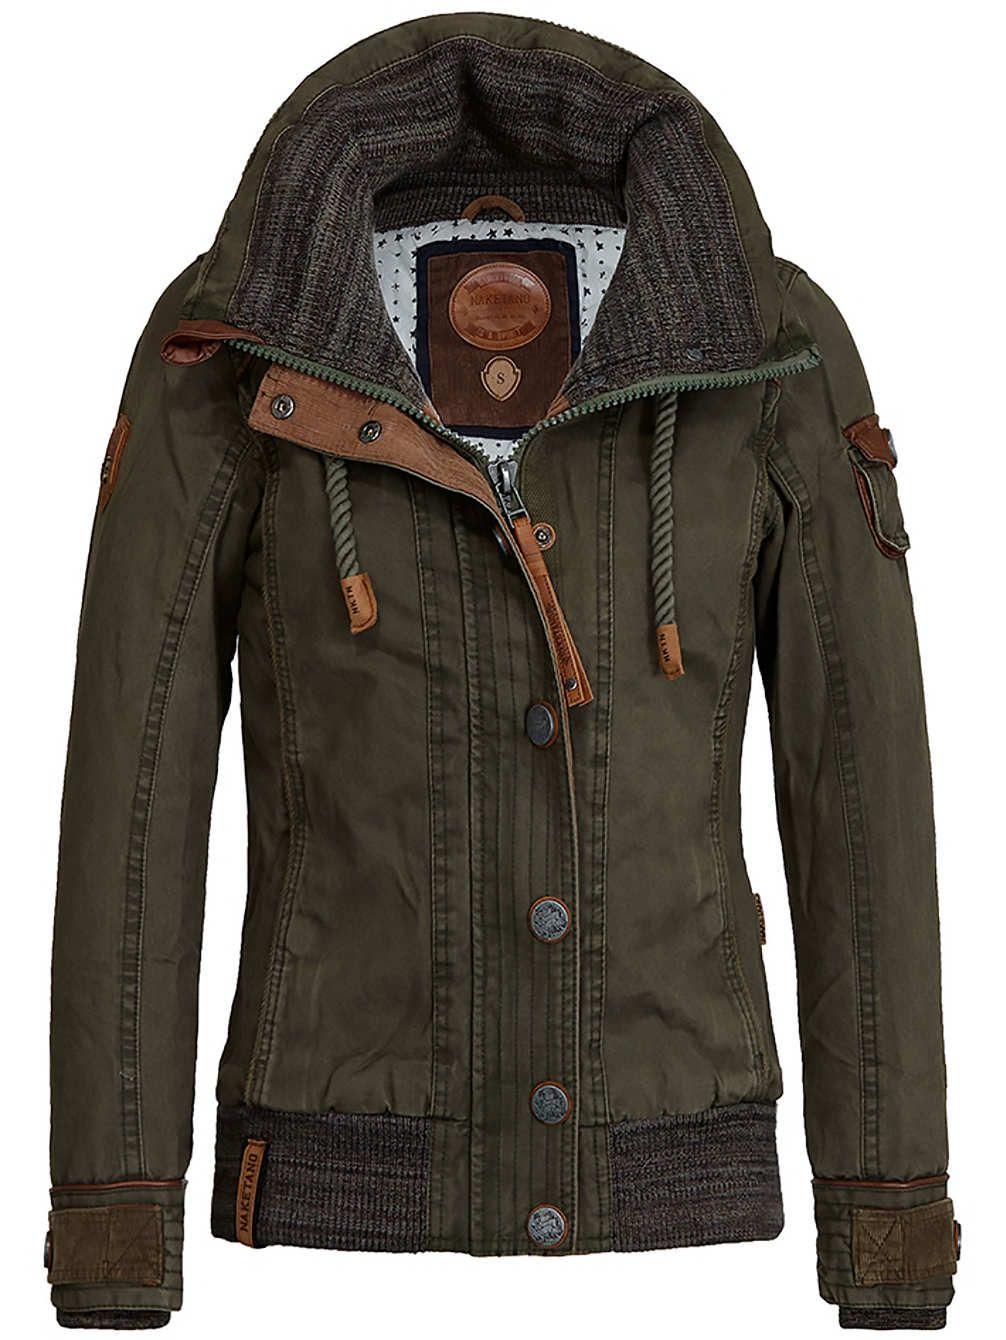 Naketano The Ruler Jacket in 2019 | Jackets, Fashion, Cute